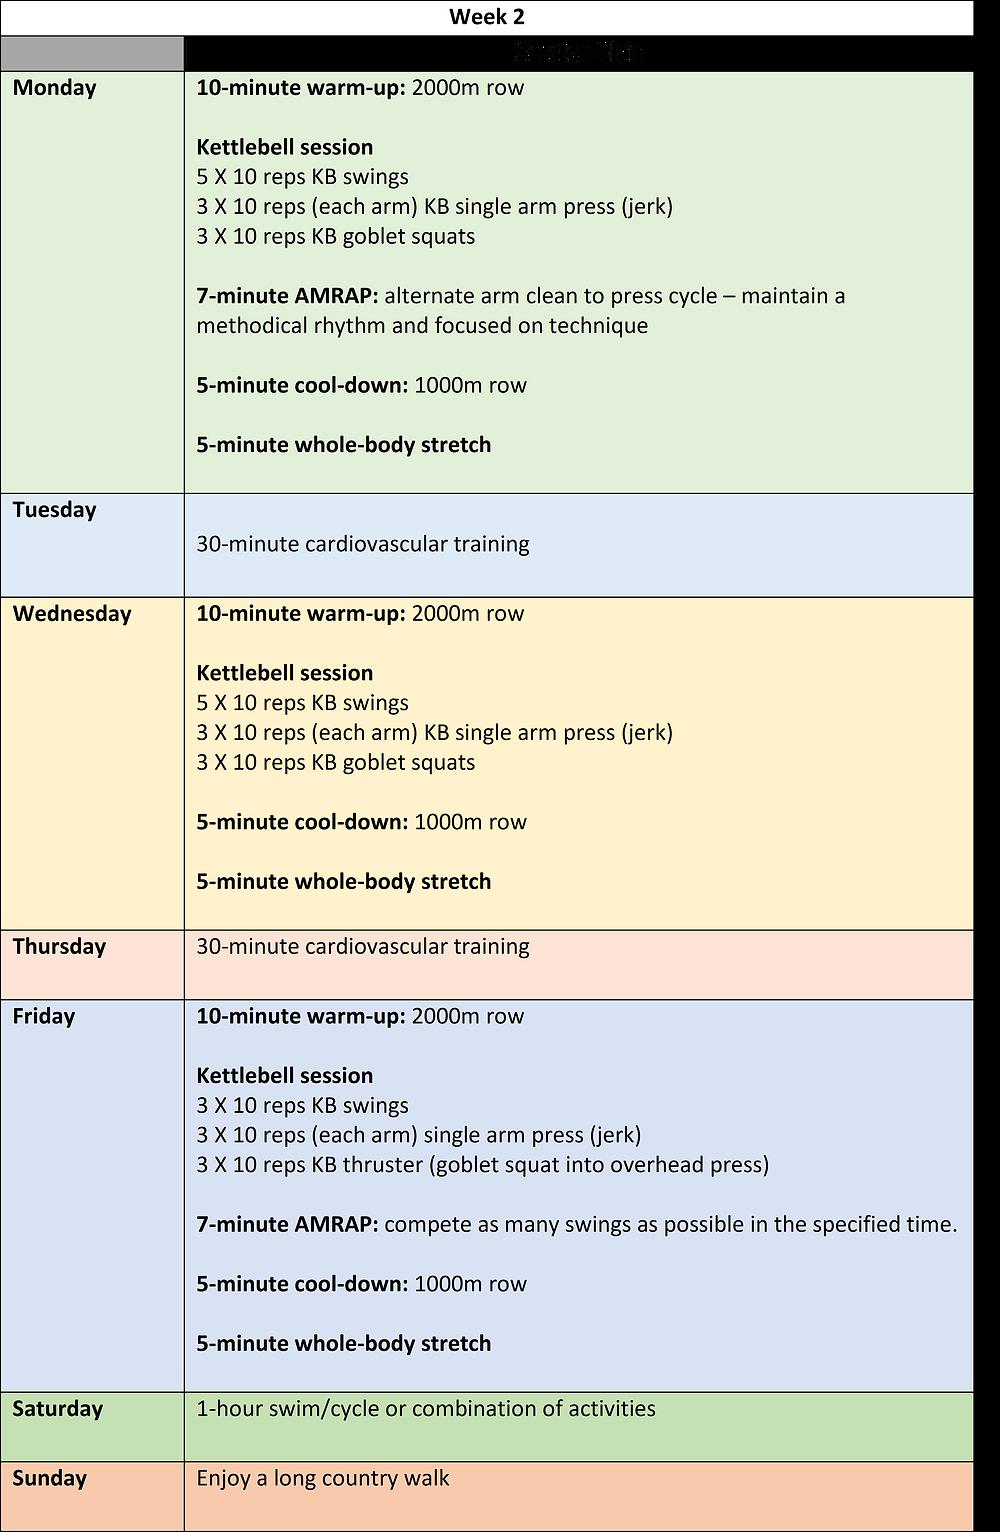 week 2 of a 6-week kettlebell training programme